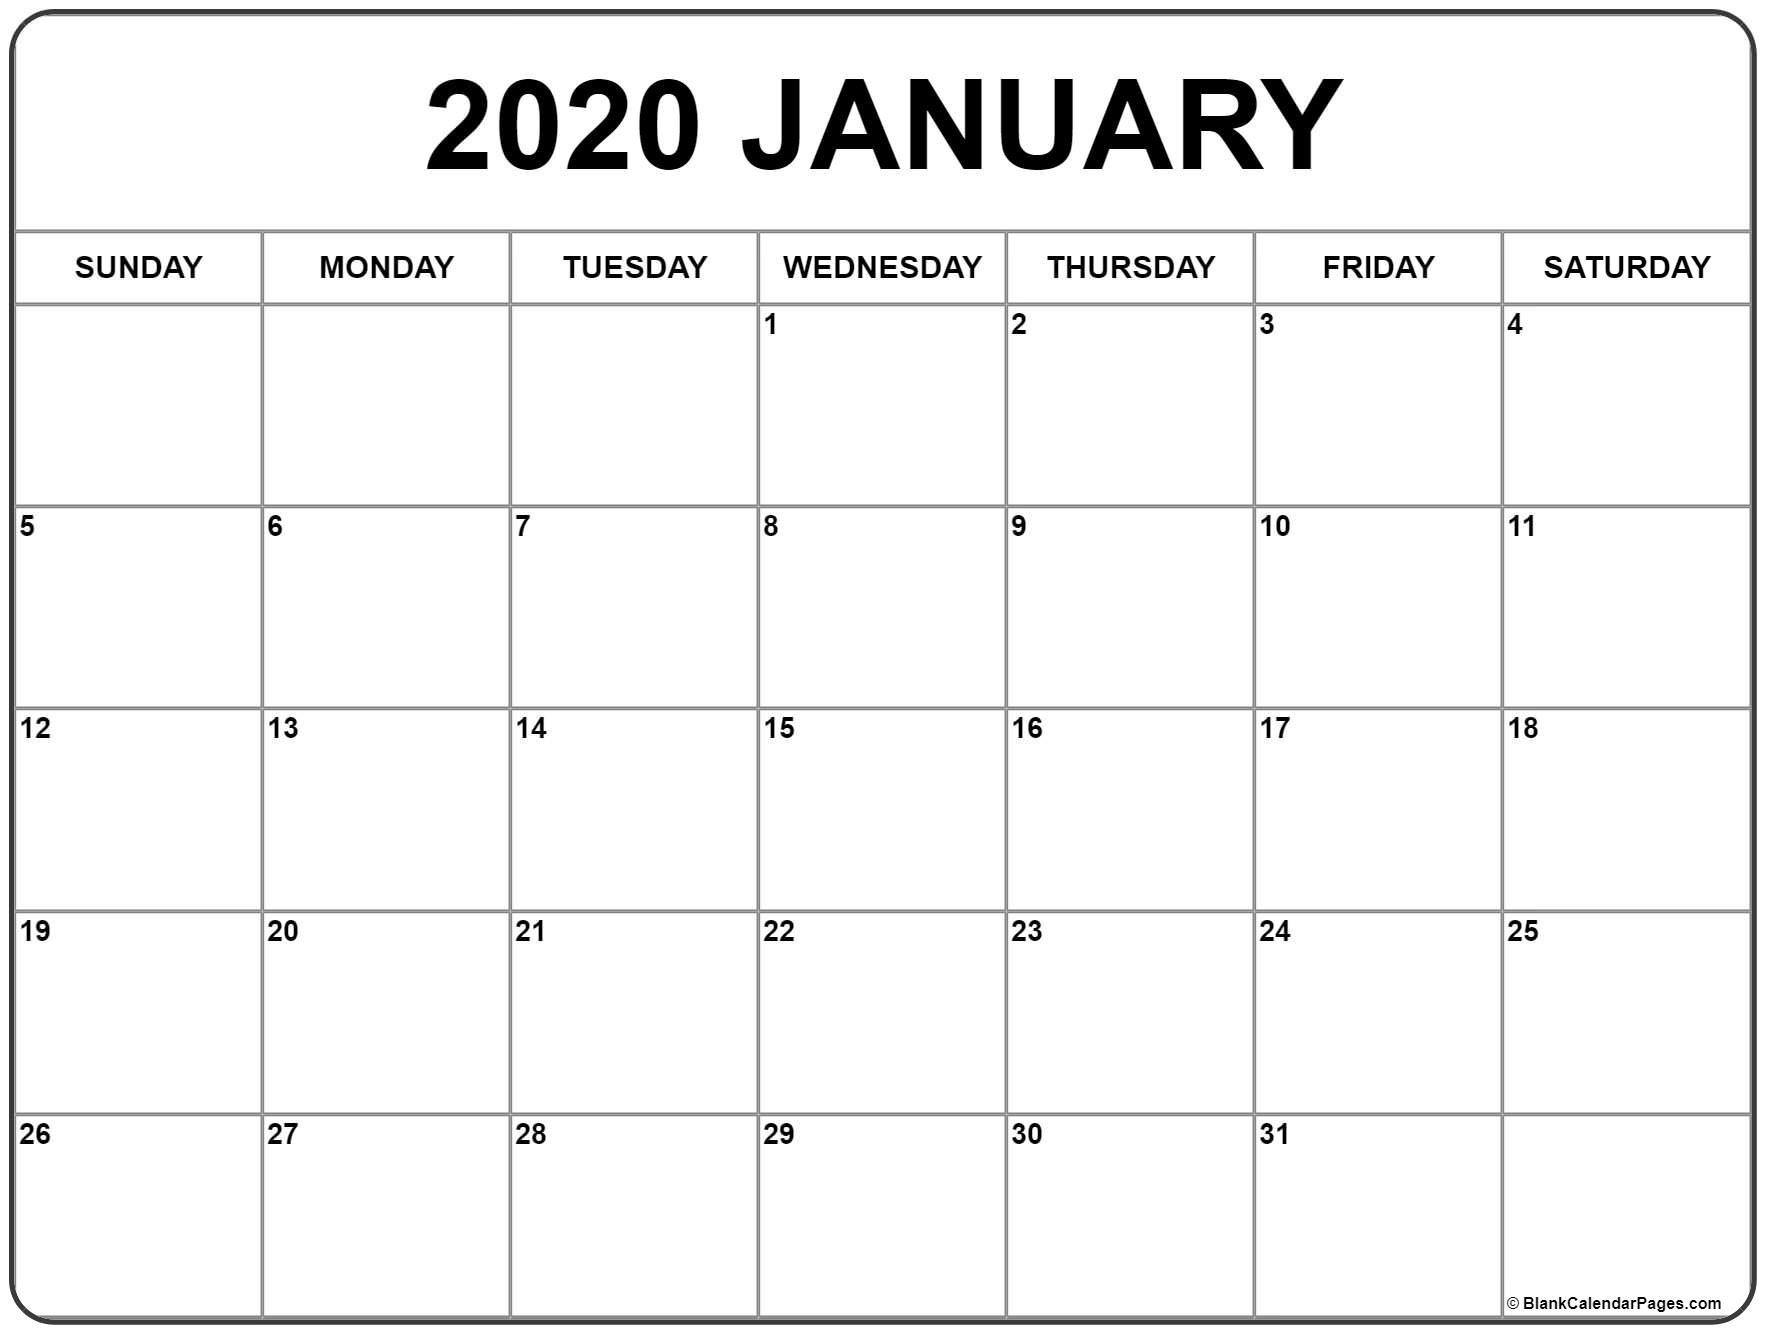 January 2020 Calendar | Free Printable Monthly Calendars-Printable Calendar 2020 Monthly Bills